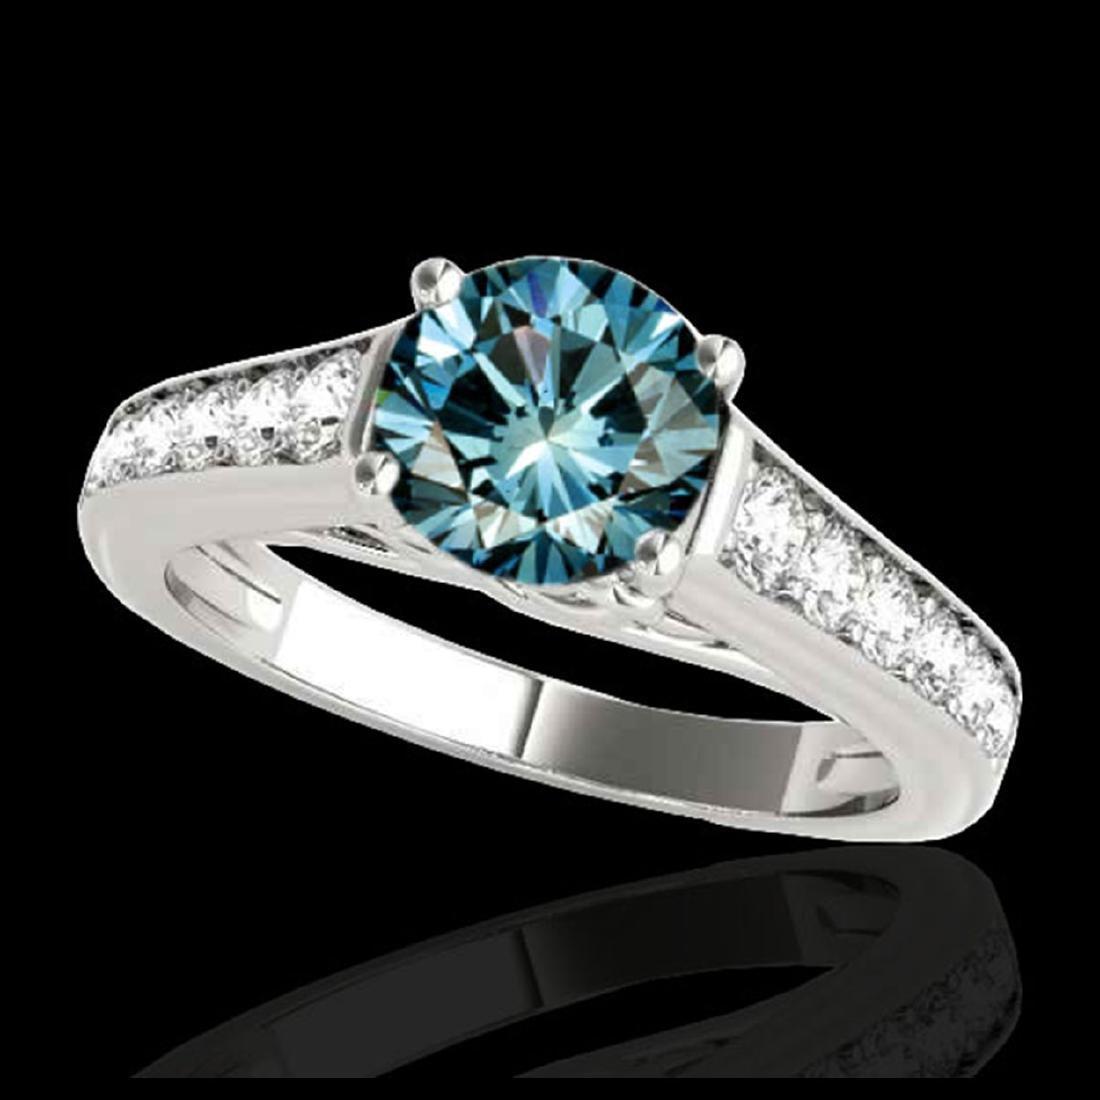 1.50 ctw SI Fancy Blue Diamond Solitaire Ring 10K White